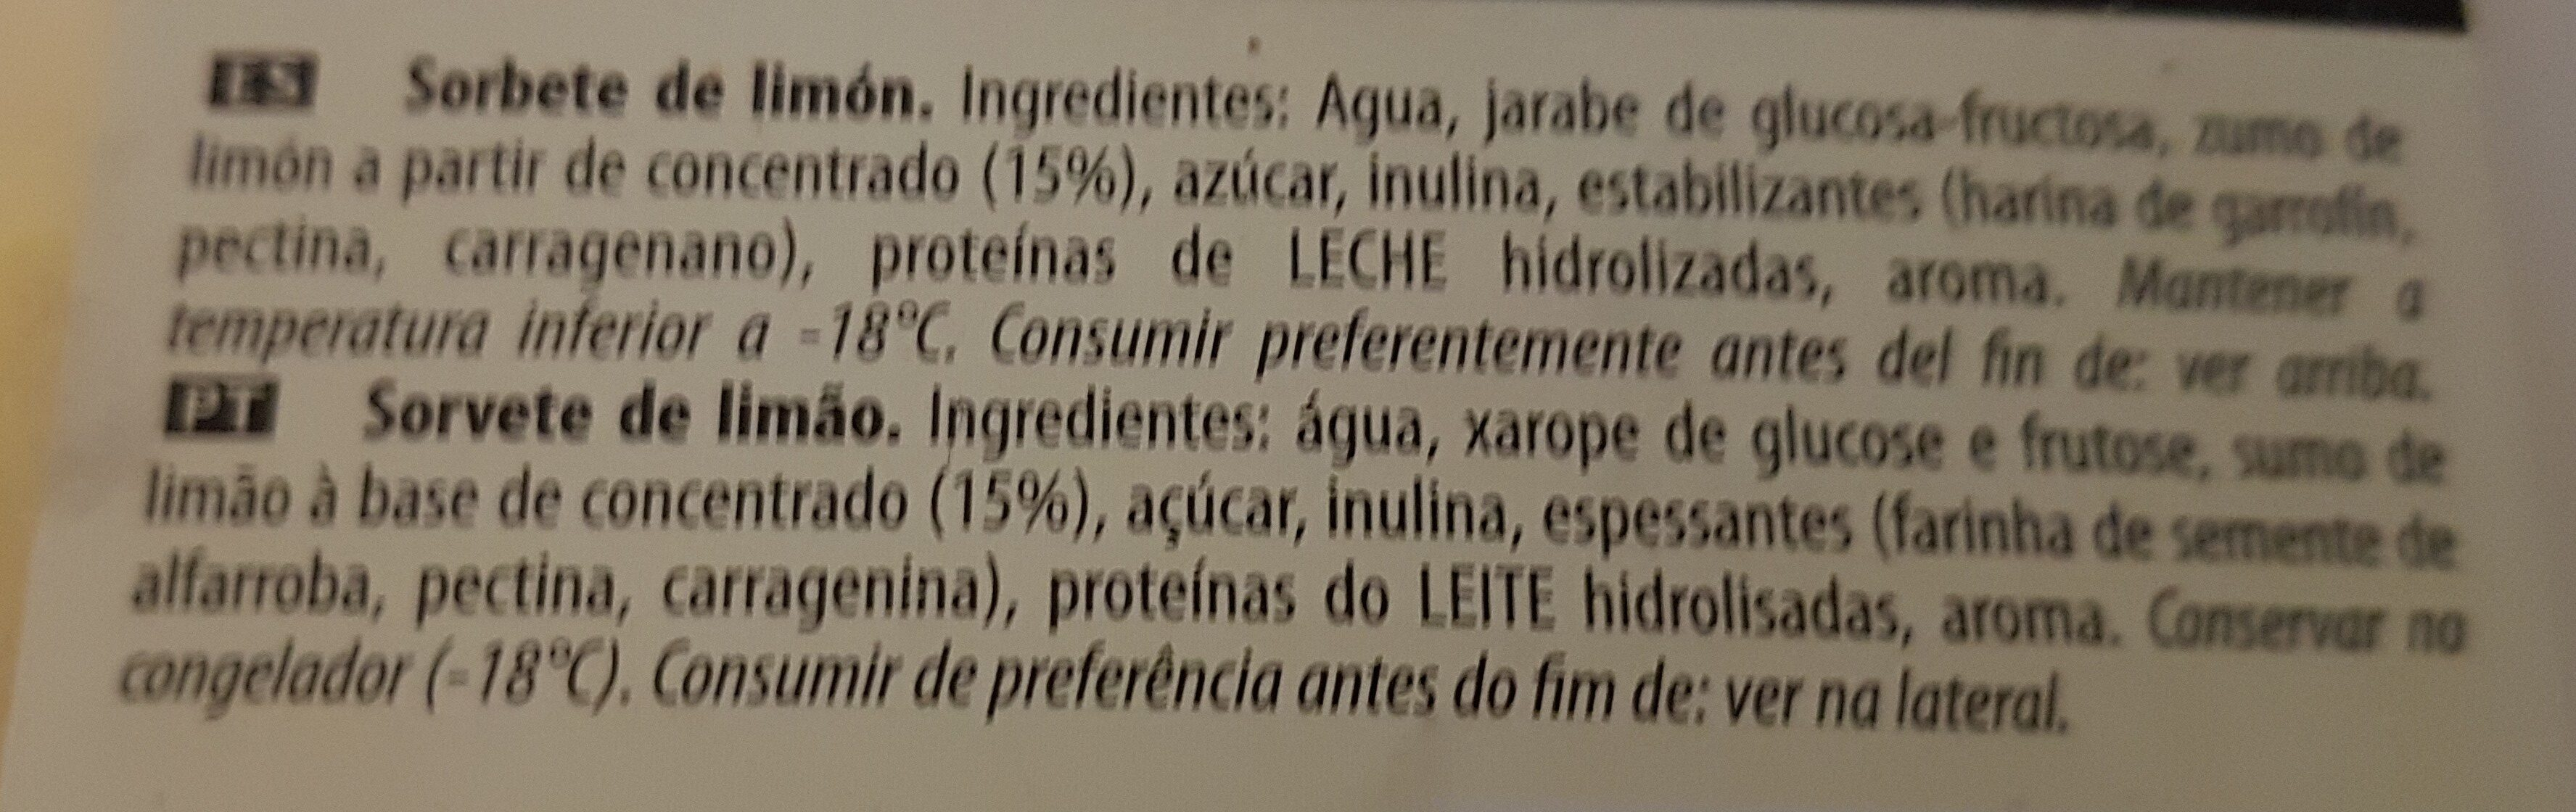 Los sorbetes LIMON - Ingredients - es